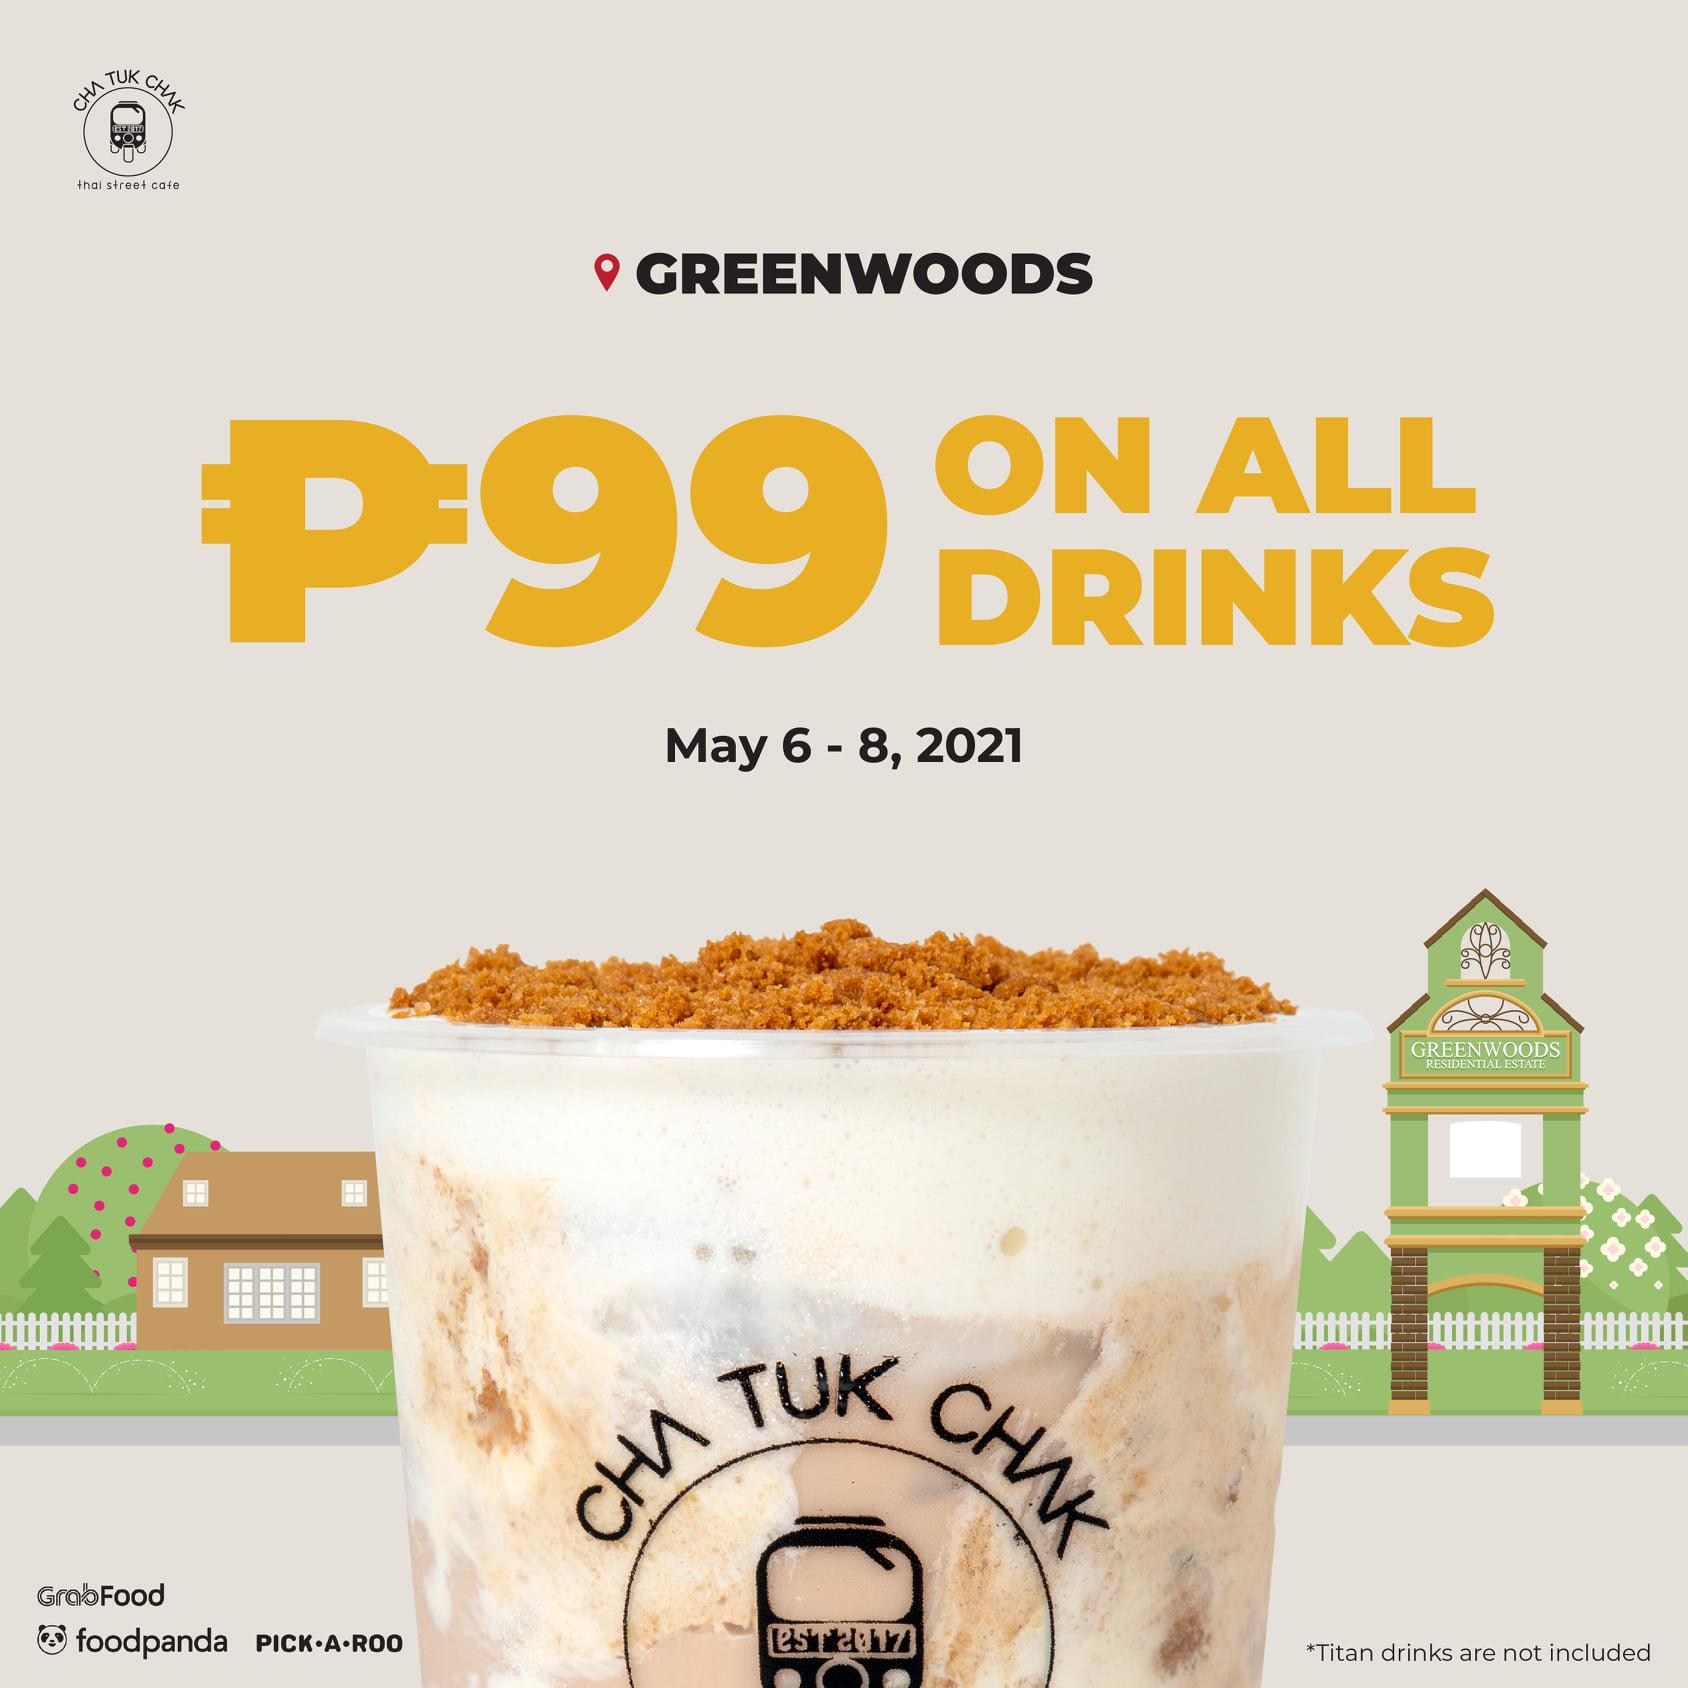 Cha Tuk Chak Greenwoods Promo 99 pesos on all drinks